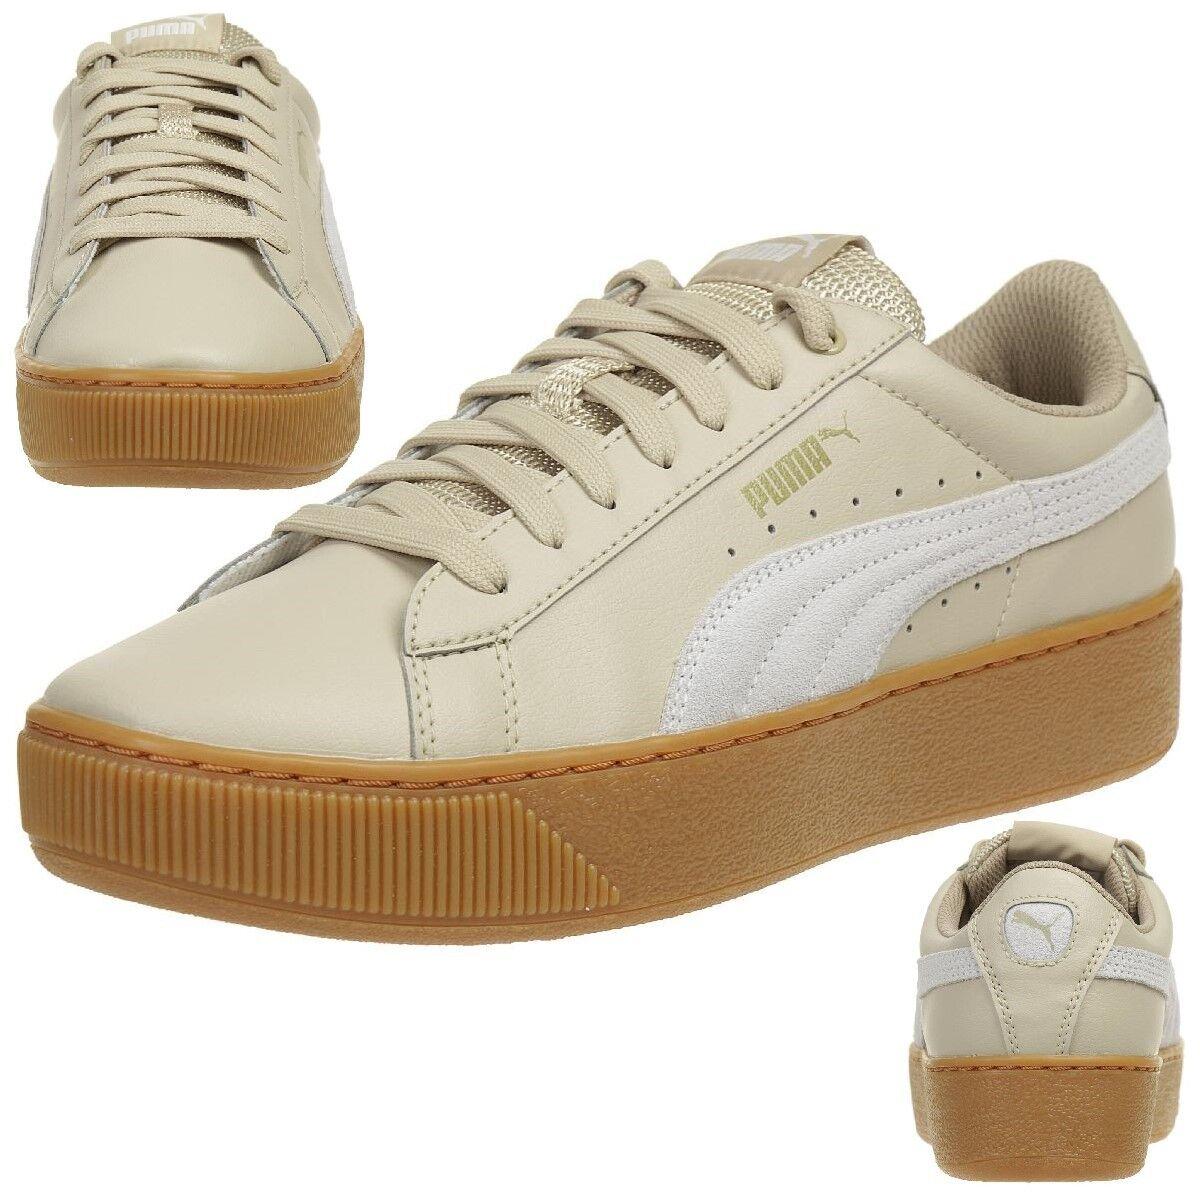 PUMA Vikky Platform Donna L Sneaker Scarpe Donna Platform 364893 03 b3338e